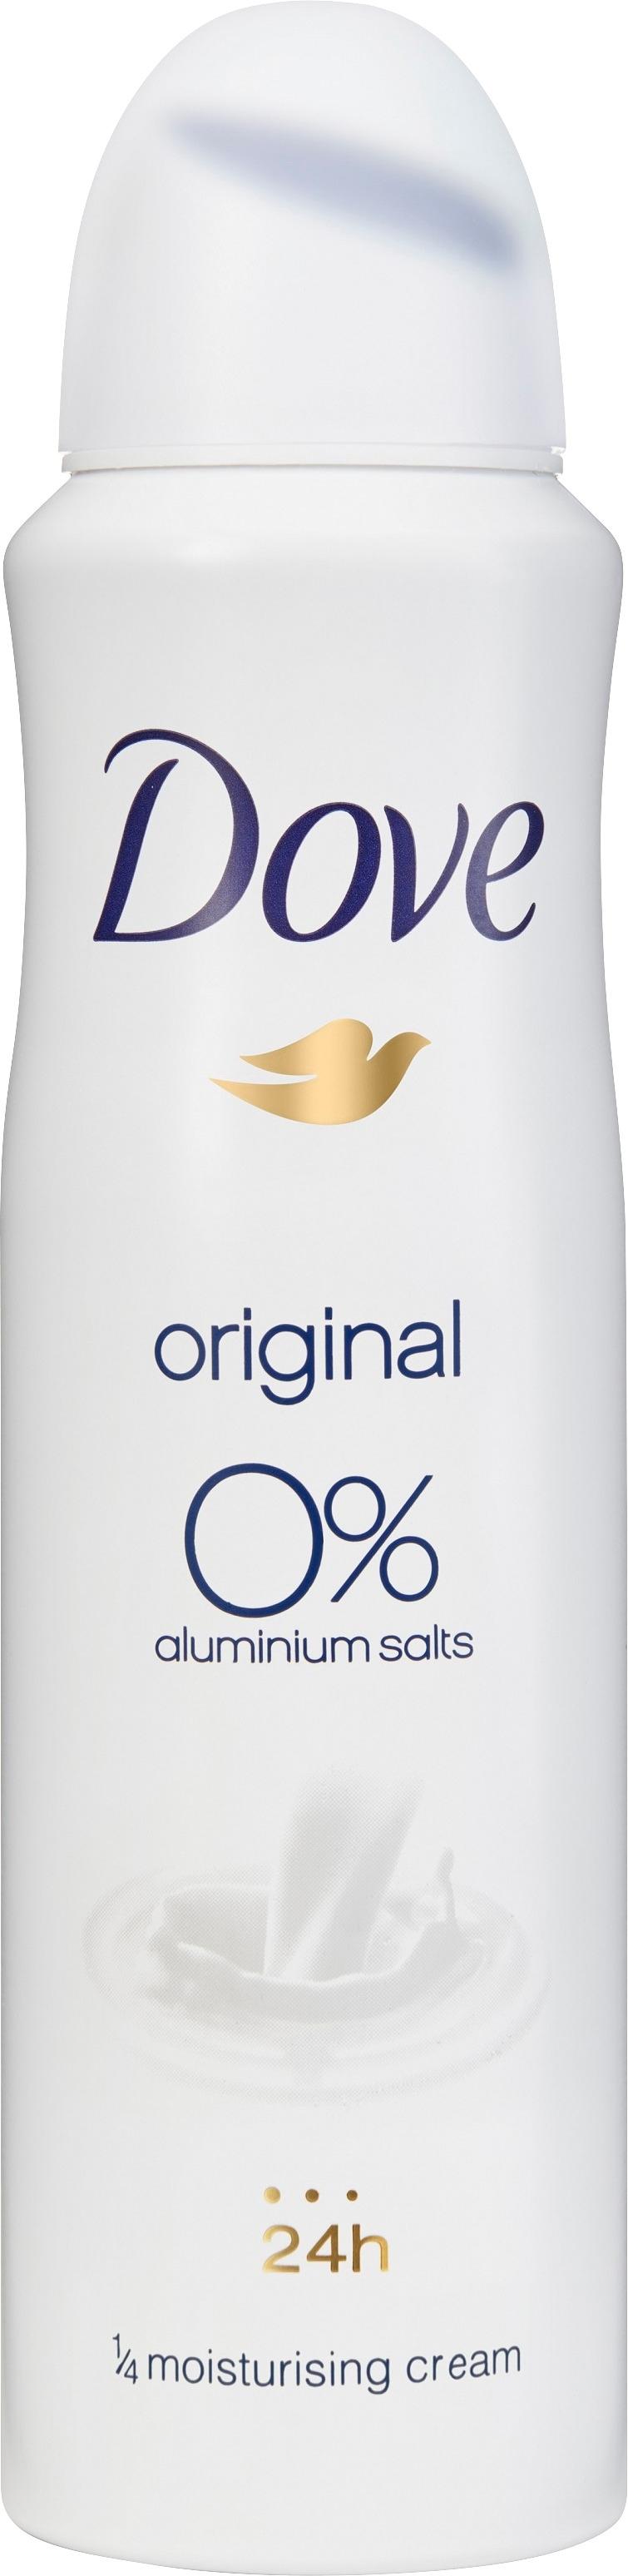 Dove Deodorant Spray Original 0% 150 ml